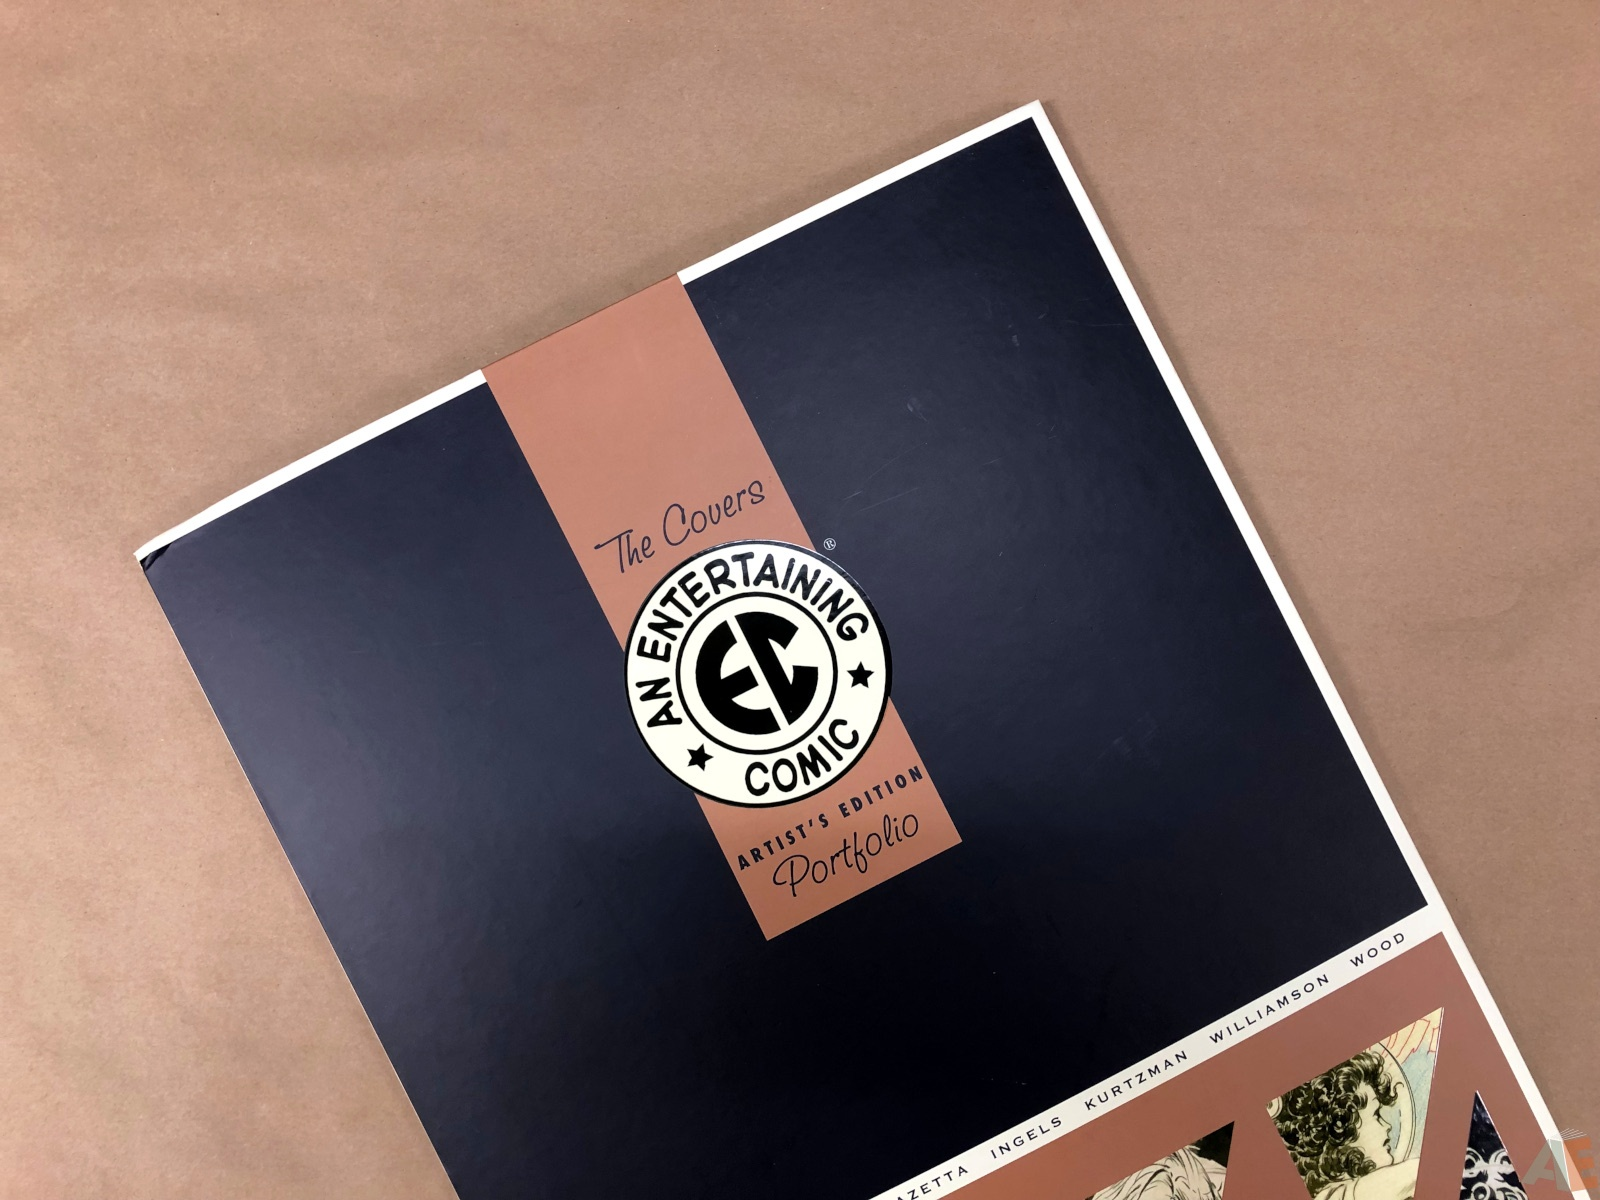 EC Covers Portfolio Artist's Edition